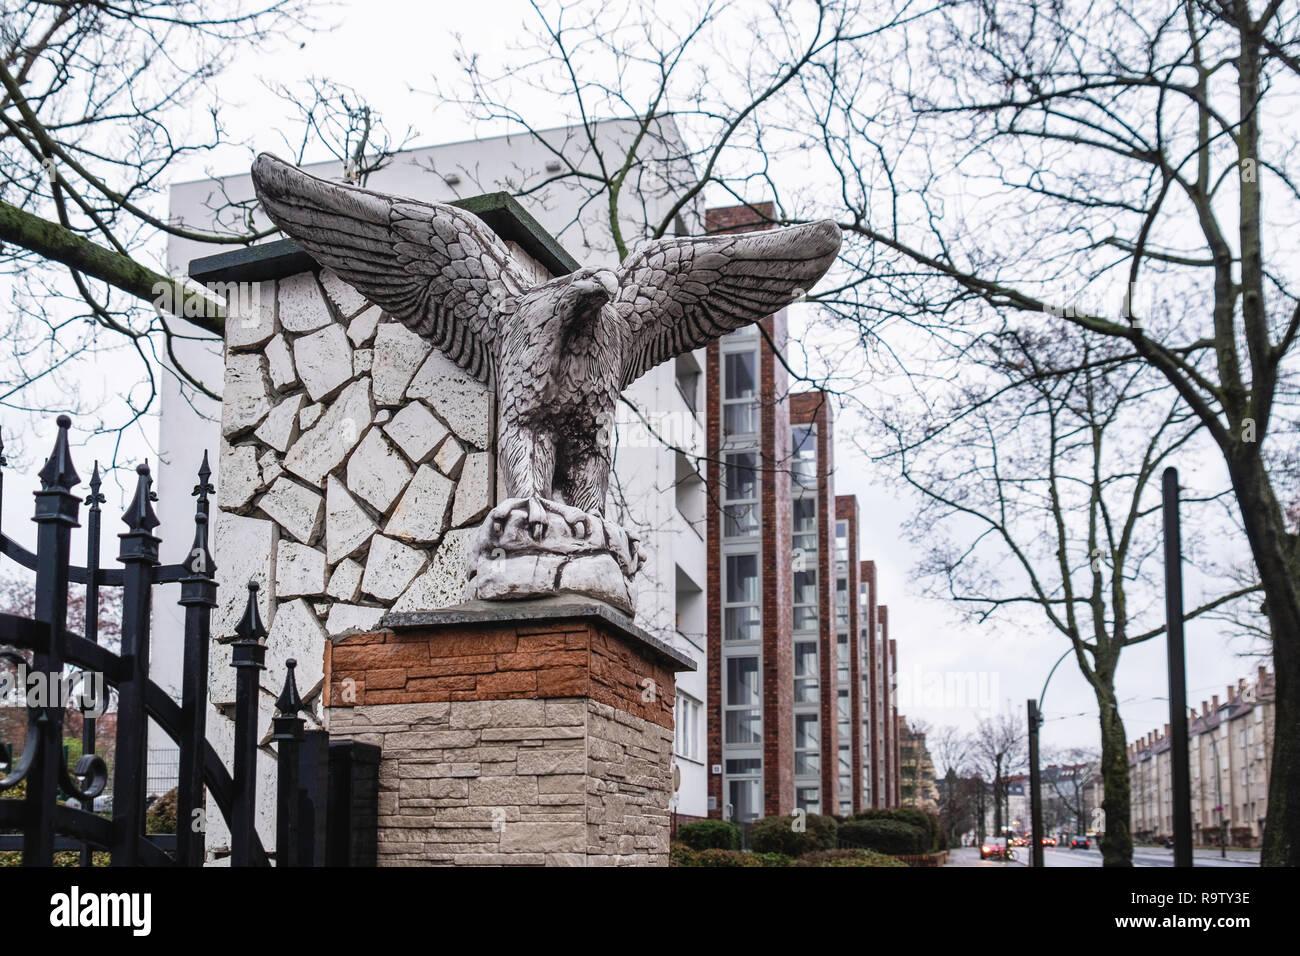 Berlin, Weissensee Stone Eagle sculpture on gatepost of building .in Rennbahnstrasse - Stock Image